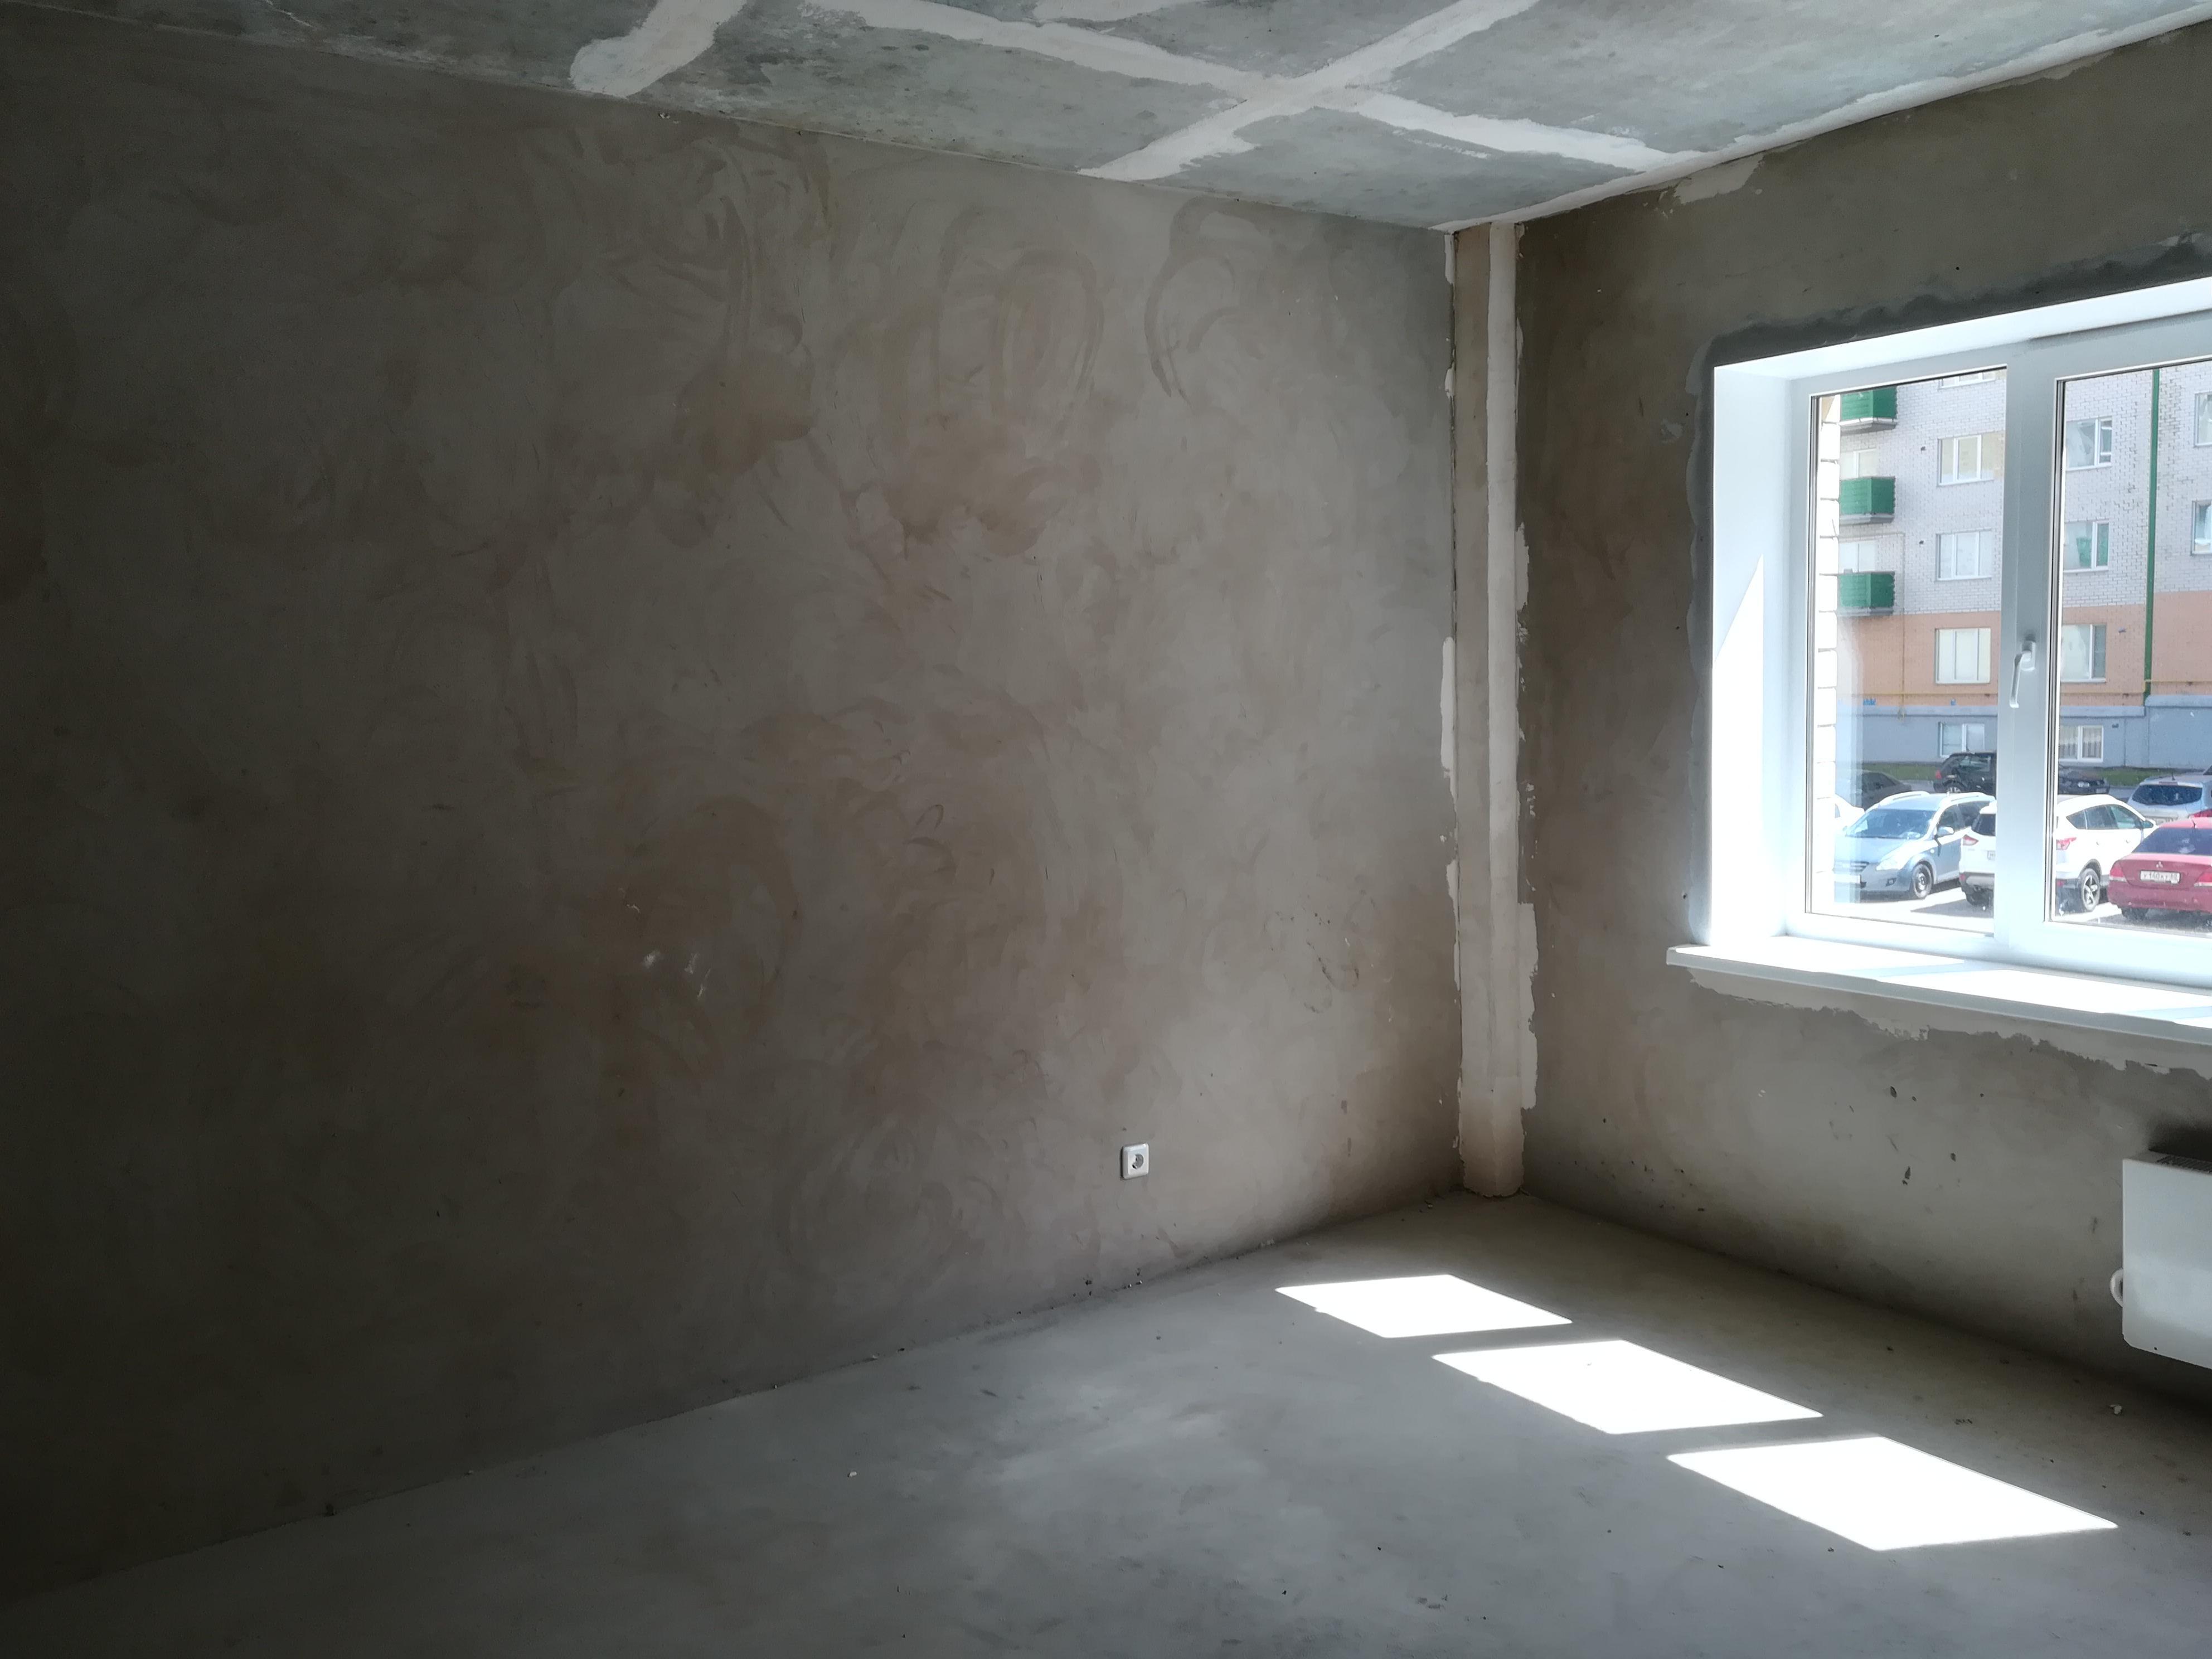 Однокомнатная квартира - ул. Никольская, д. 5а